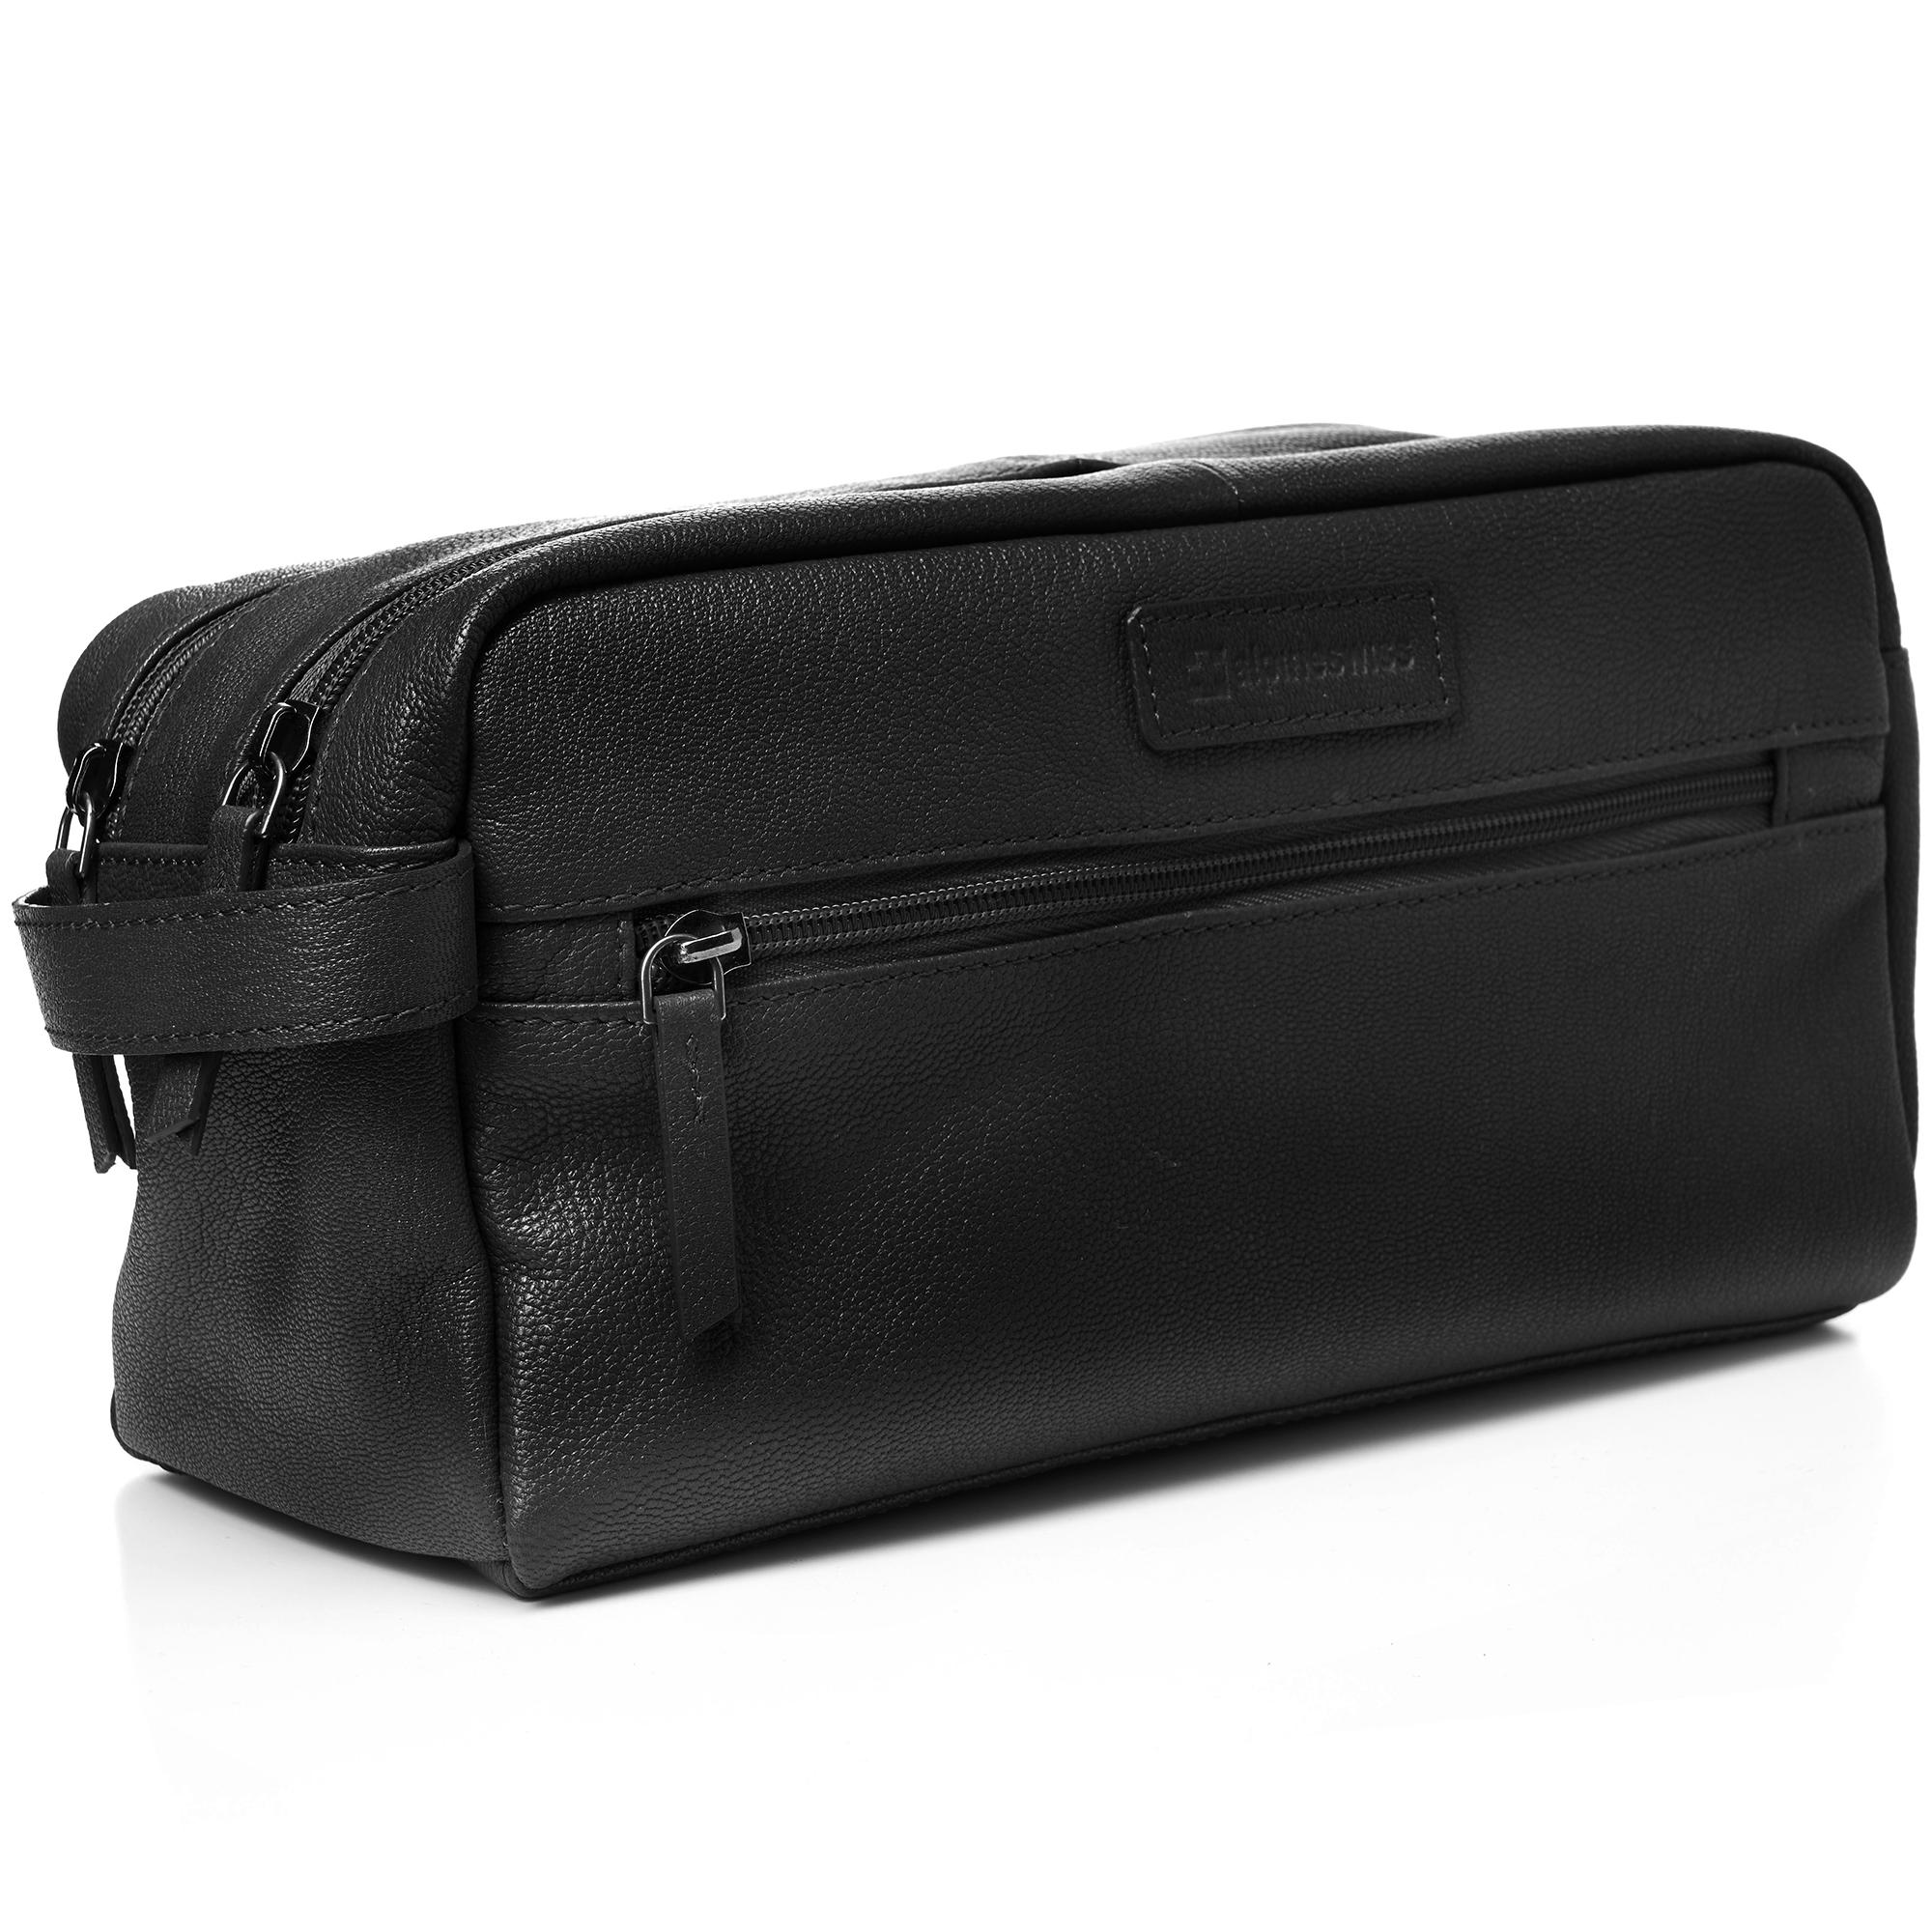 AlpineSwiss-Sedona-Toiletry-Bag-Genuine-Leather-Shaving-Kit-Dopp-Kit-Travel-Case thumbnail 13